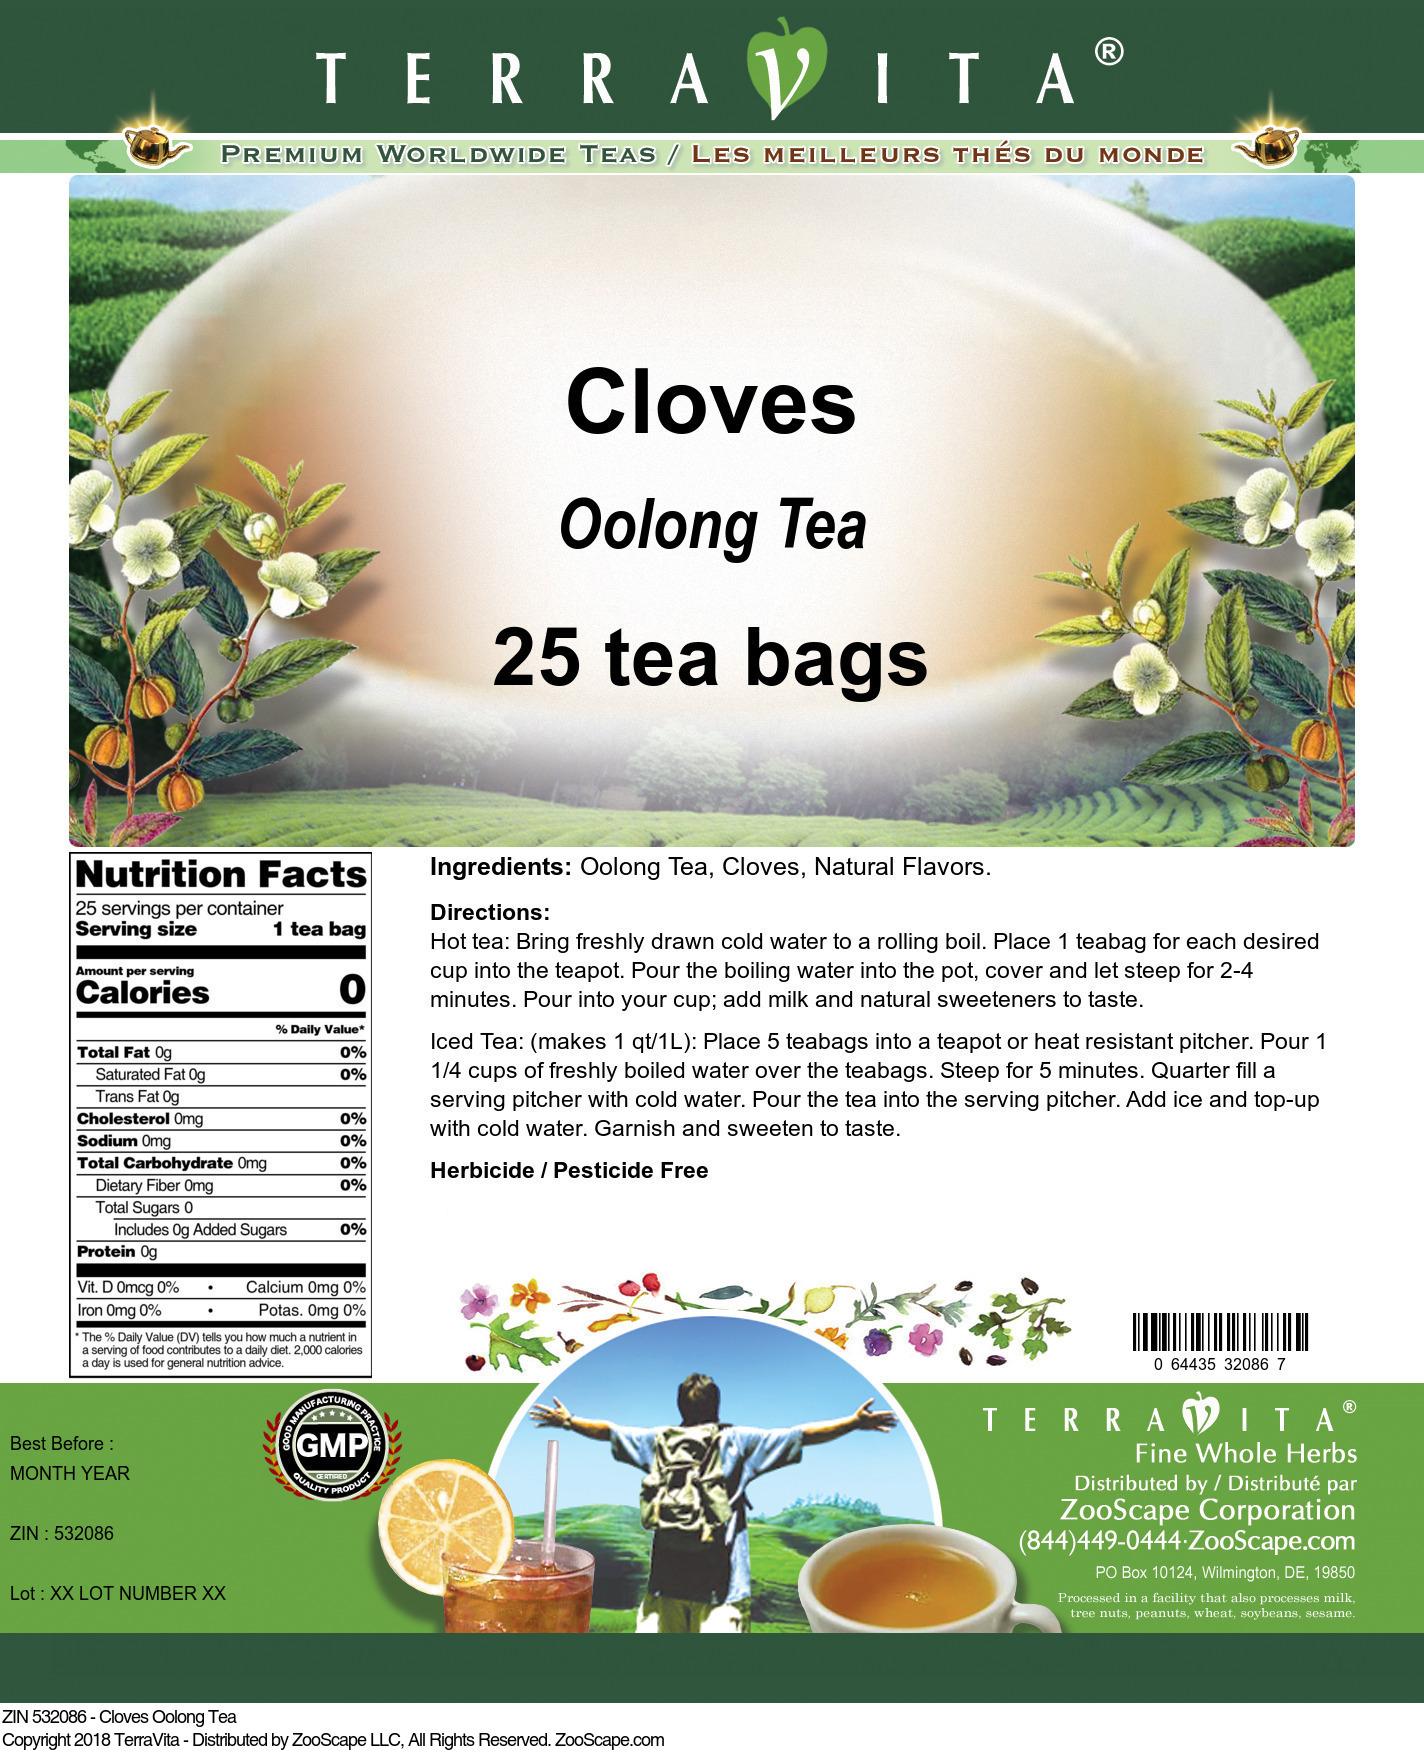 Cloves Oolong Tea